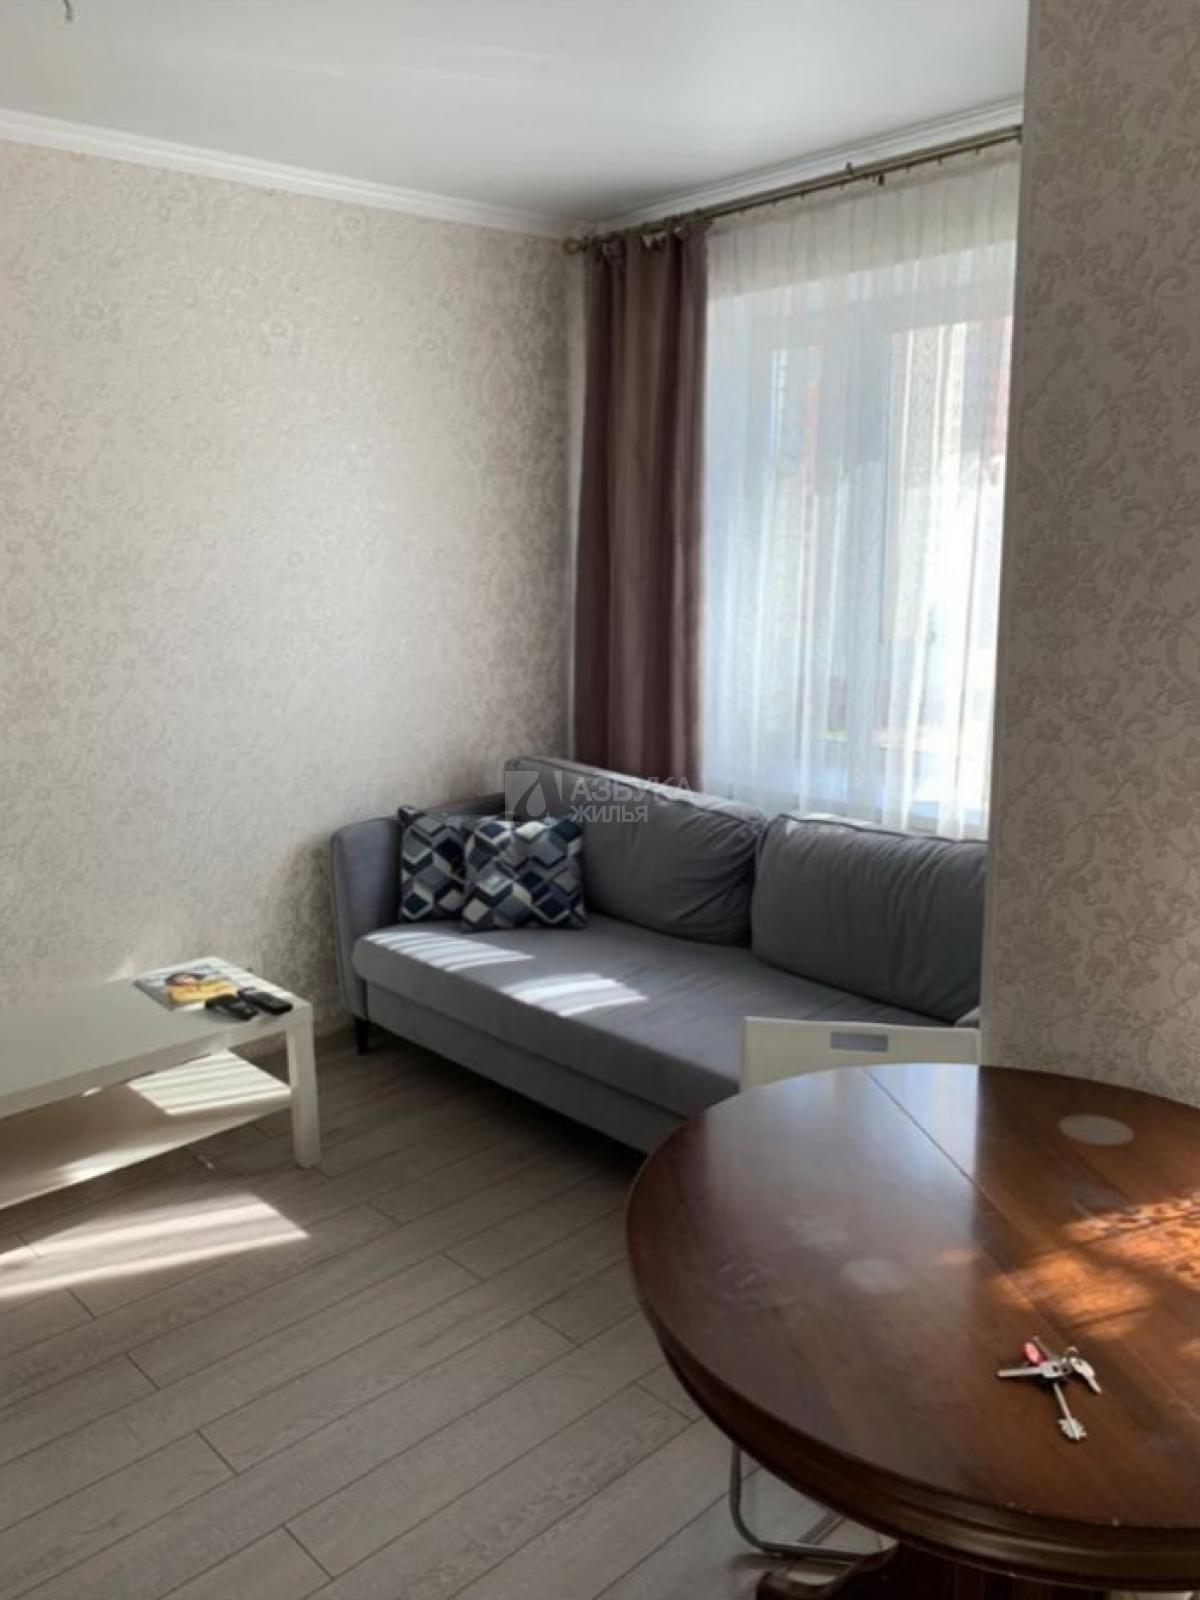 Фото №4 - 2-комнатная квартира, Люберцы, Камова улица 9 корпус 2, метро Некрасовка